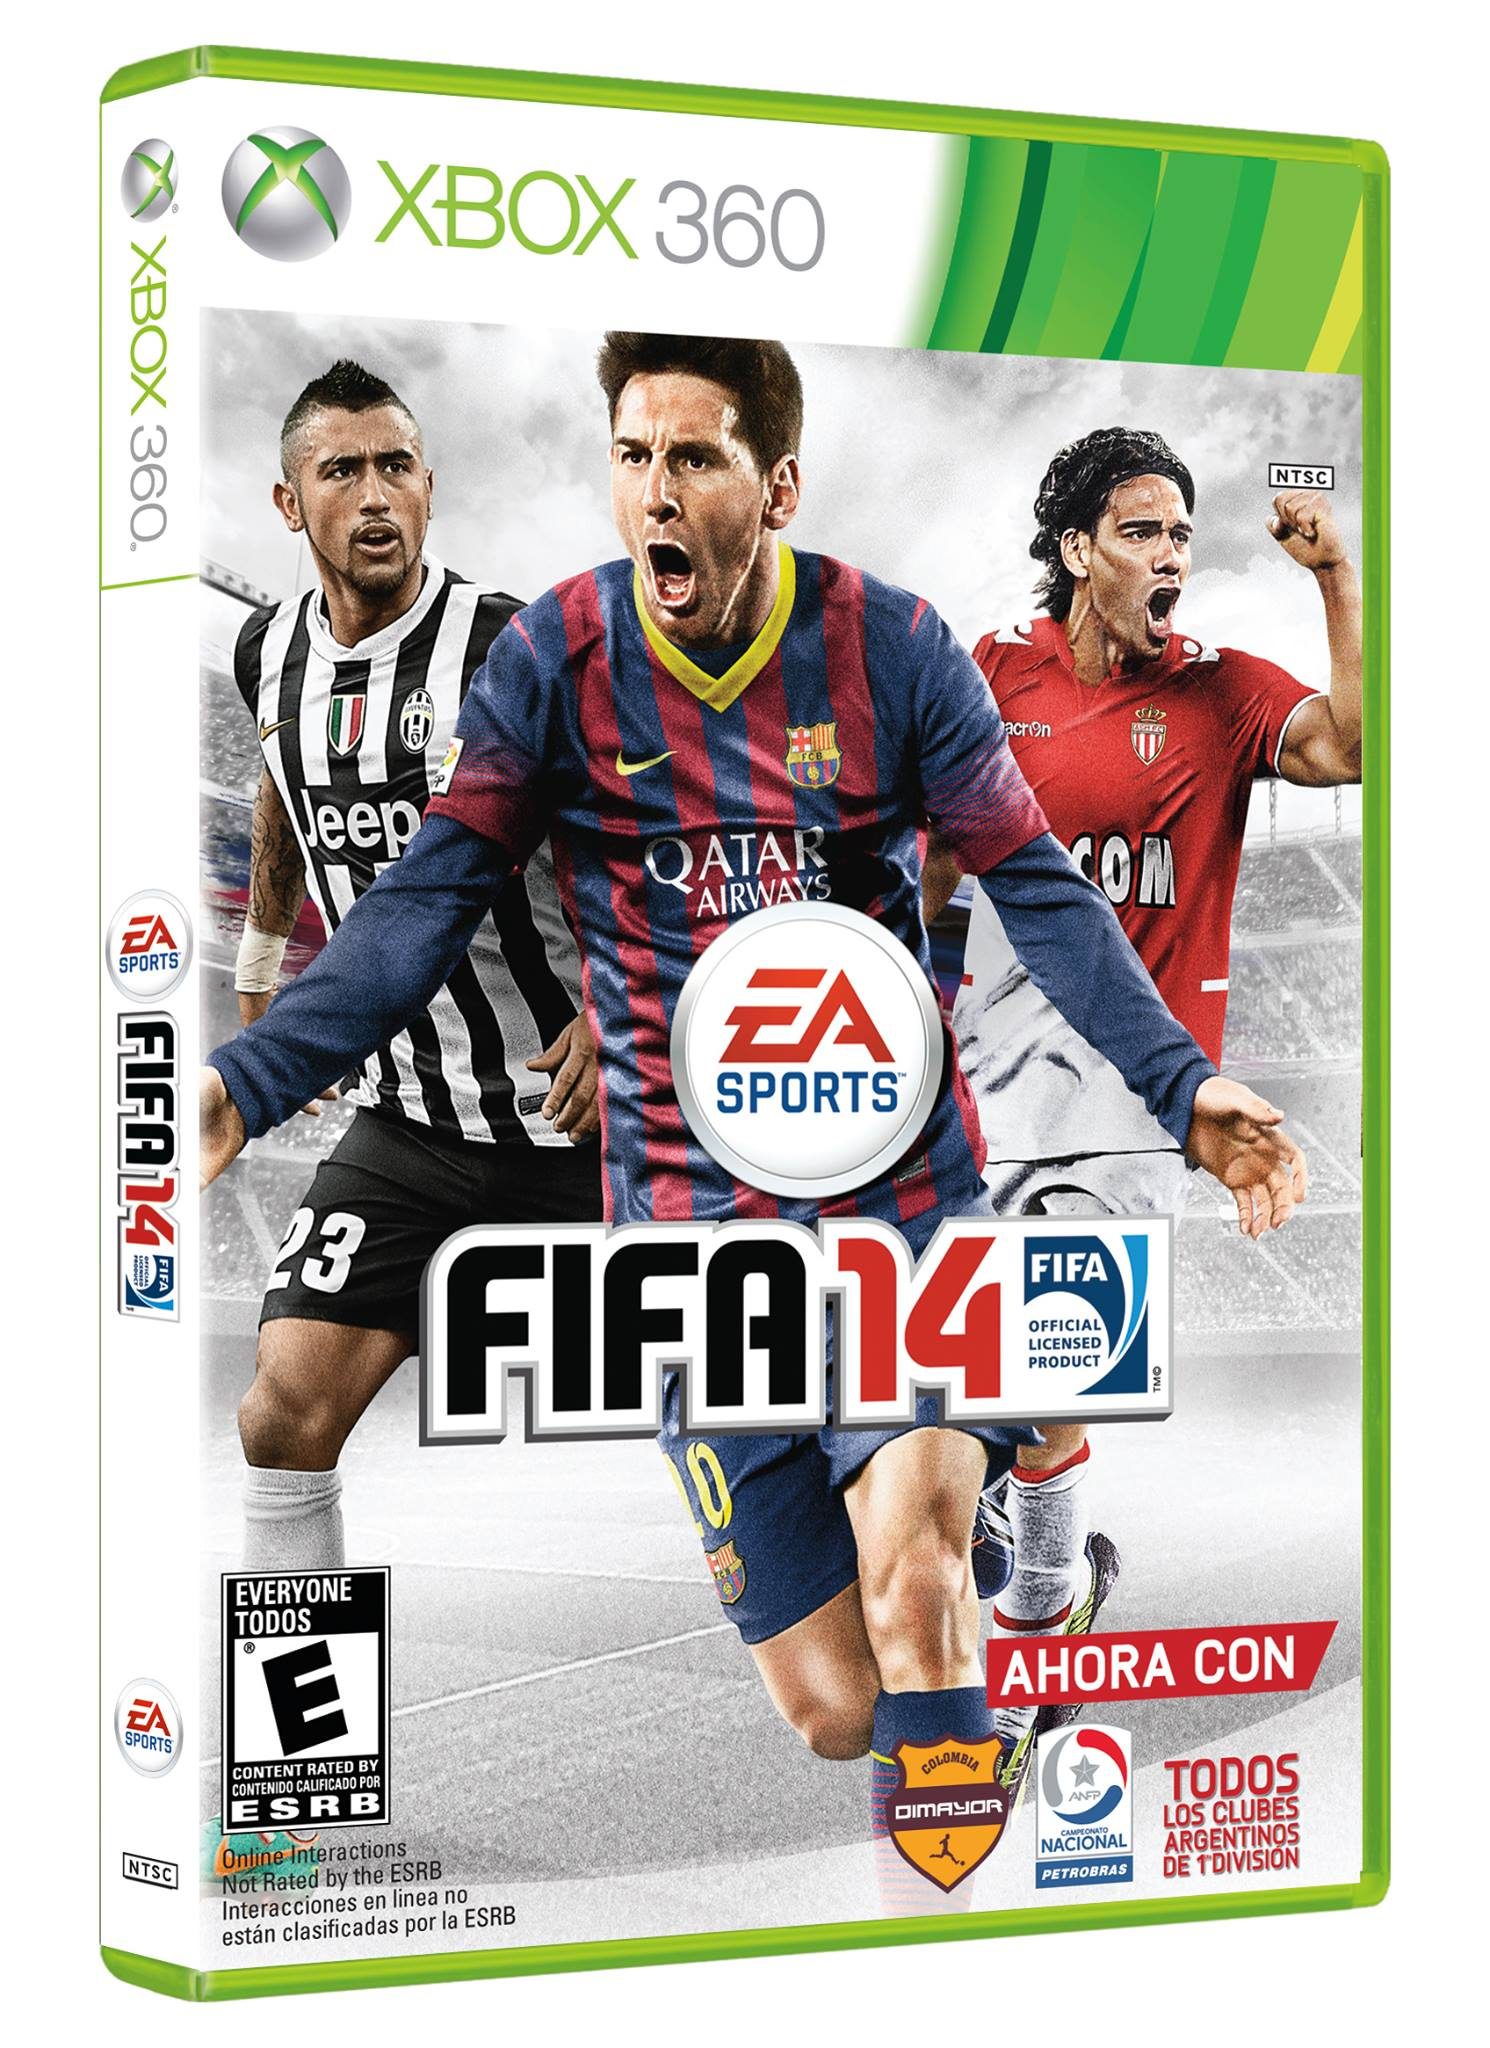 fifa14-cover-central-south-america